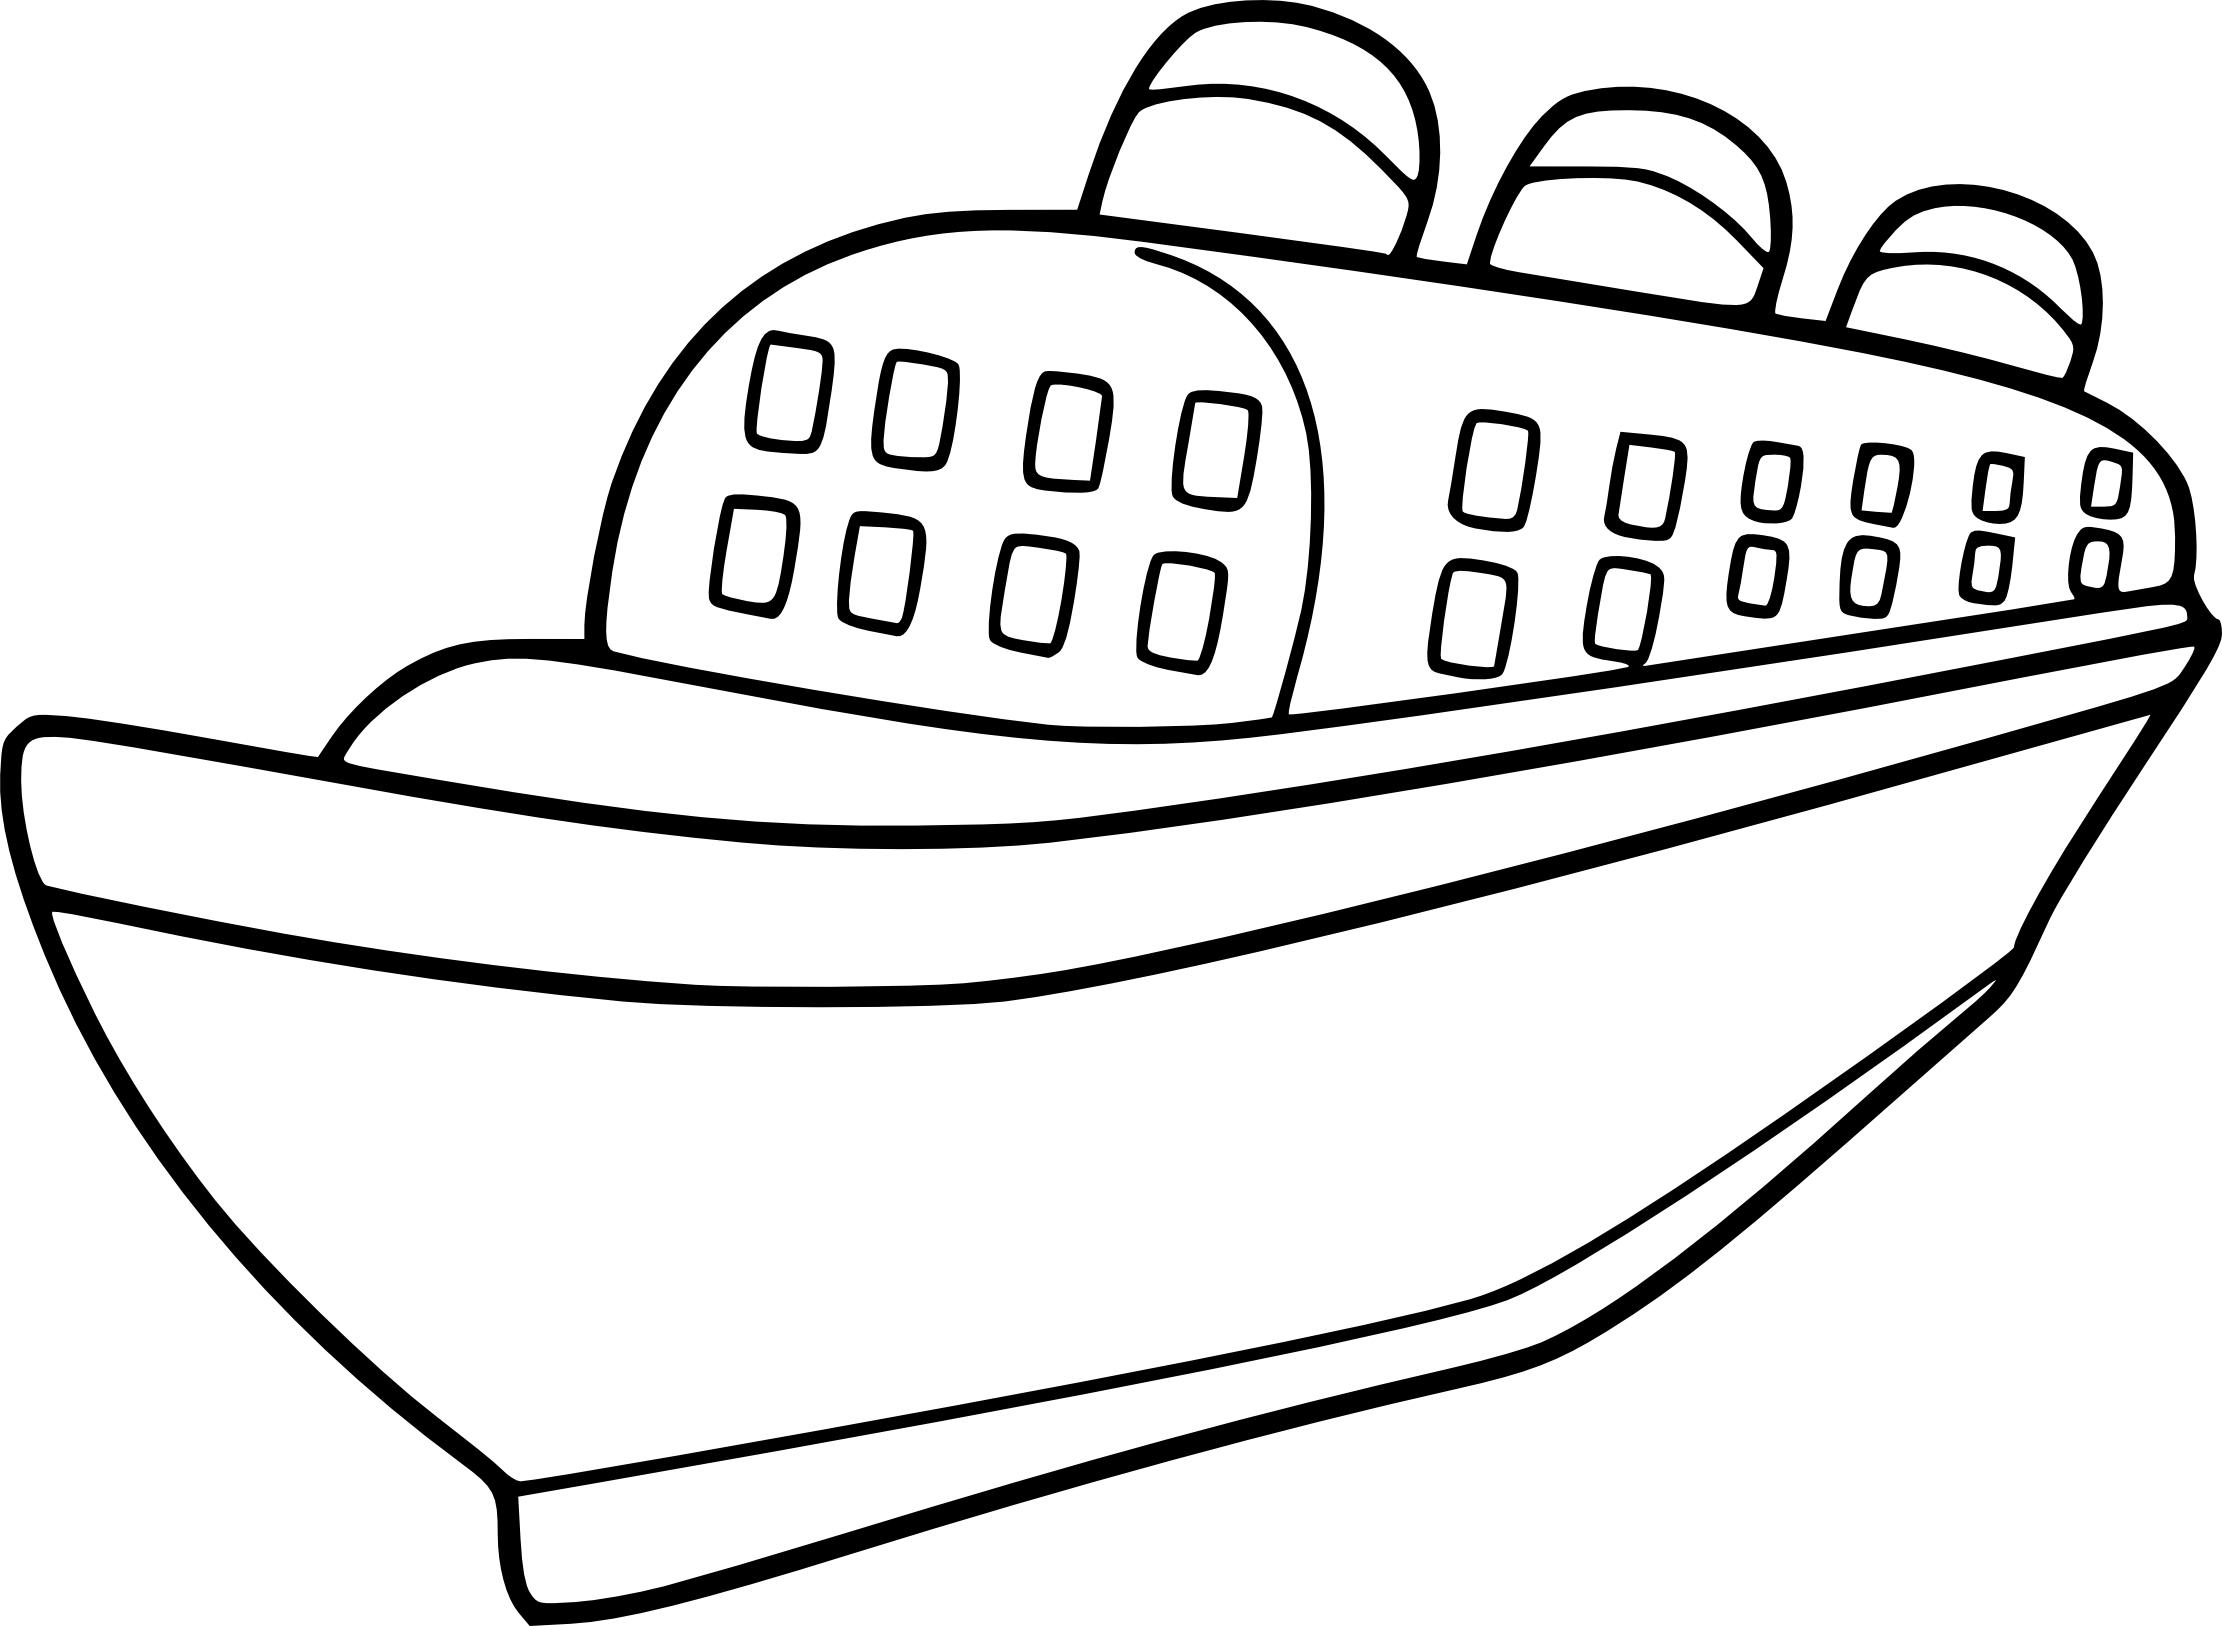 Coloriage paquebot imprimer - Paquebot dessin ...